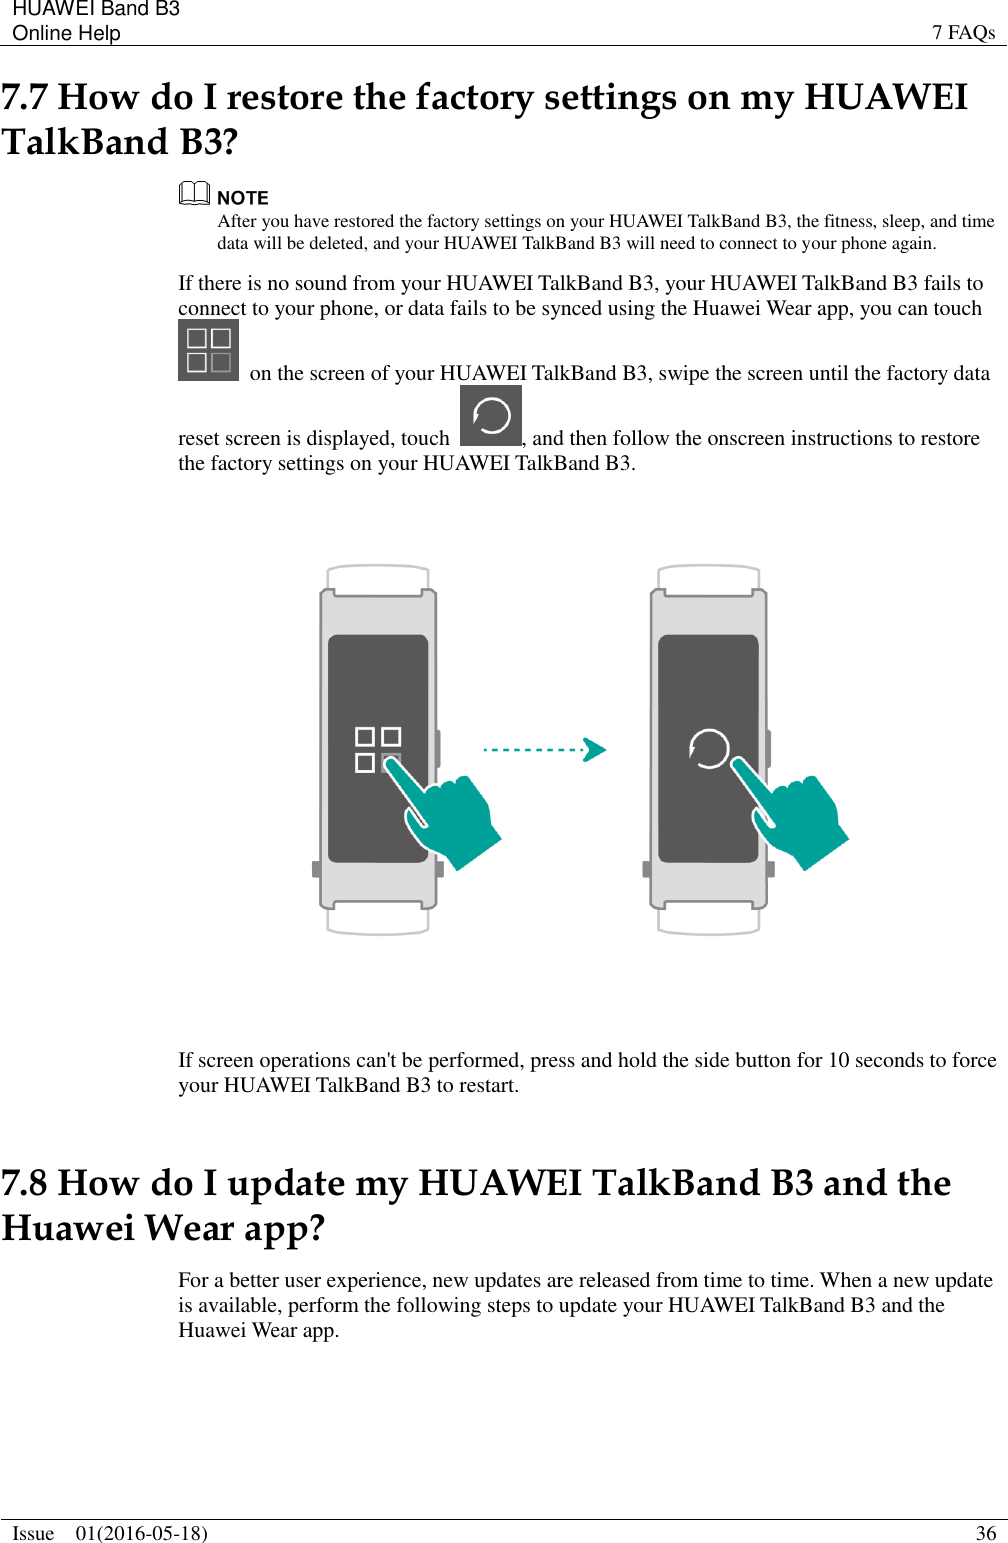 Huawei Talk Band B3 User Guide(Gemini, 01, English)